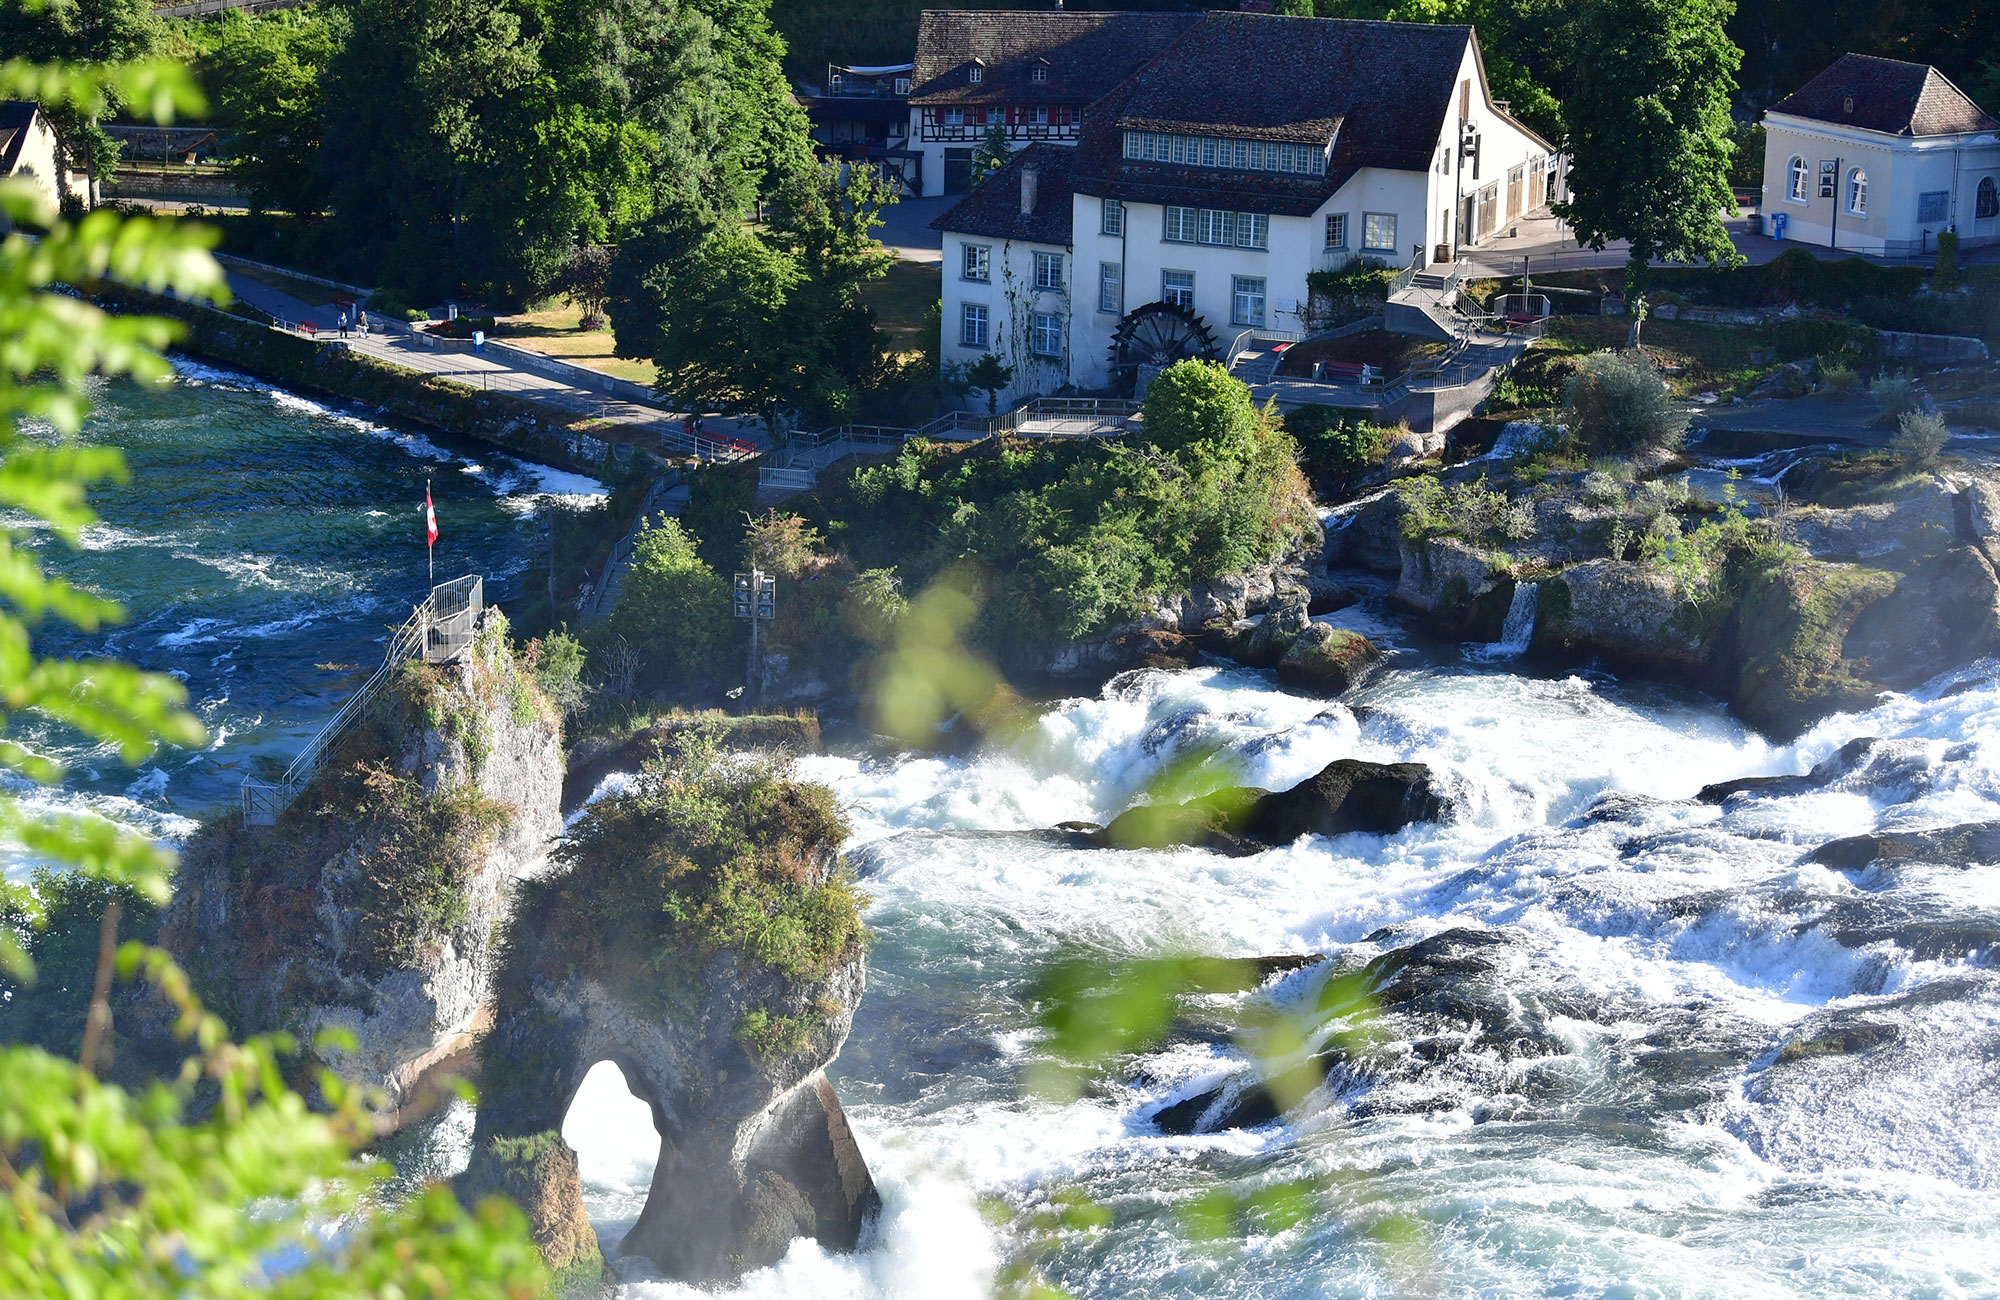 Voyage MICE Suisse - Chutes du Rhin Switzerland Meeting Trophy - Amplitudes